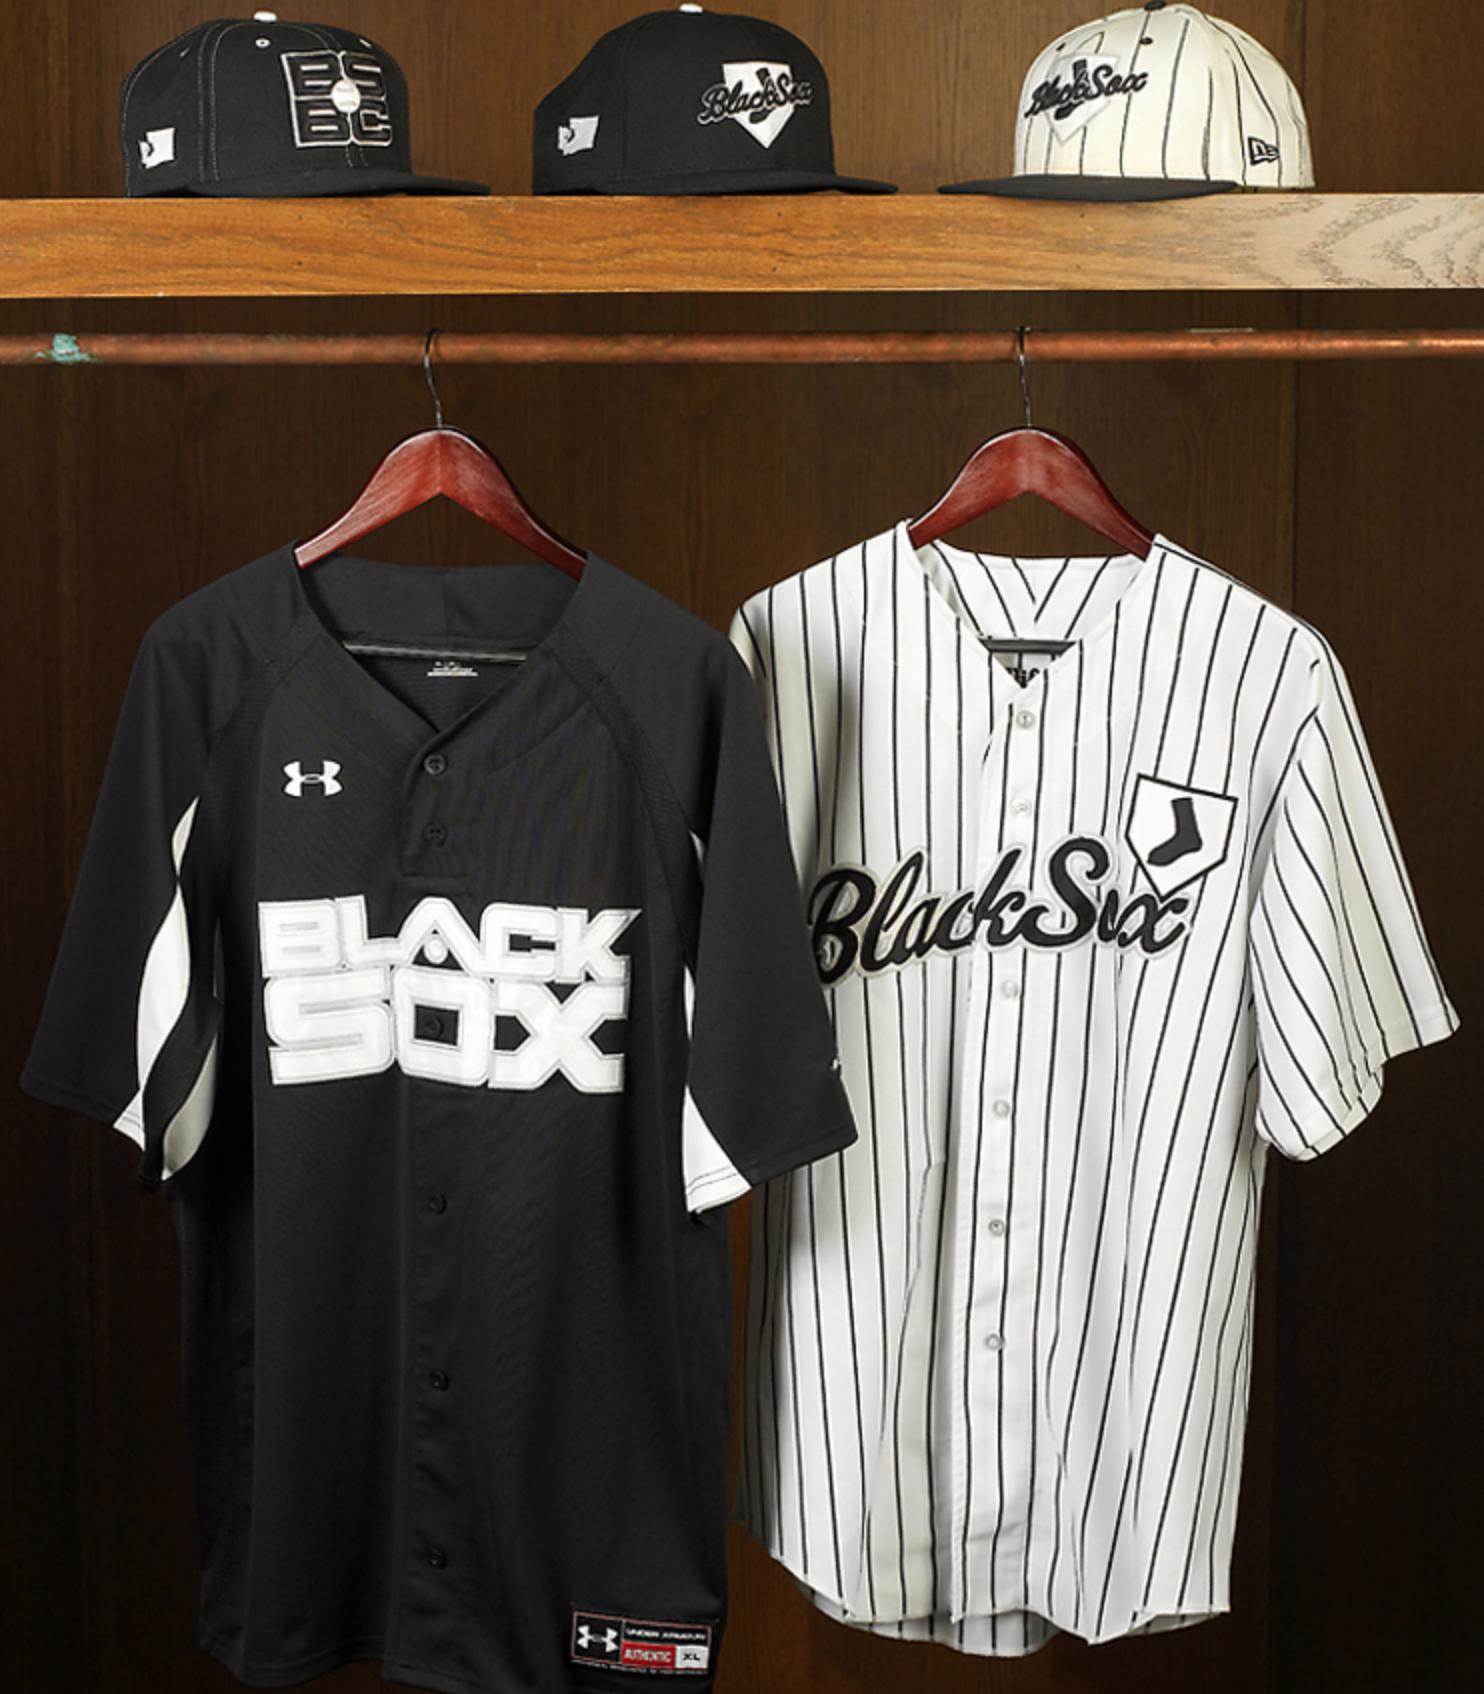 Ball Club Uniforms